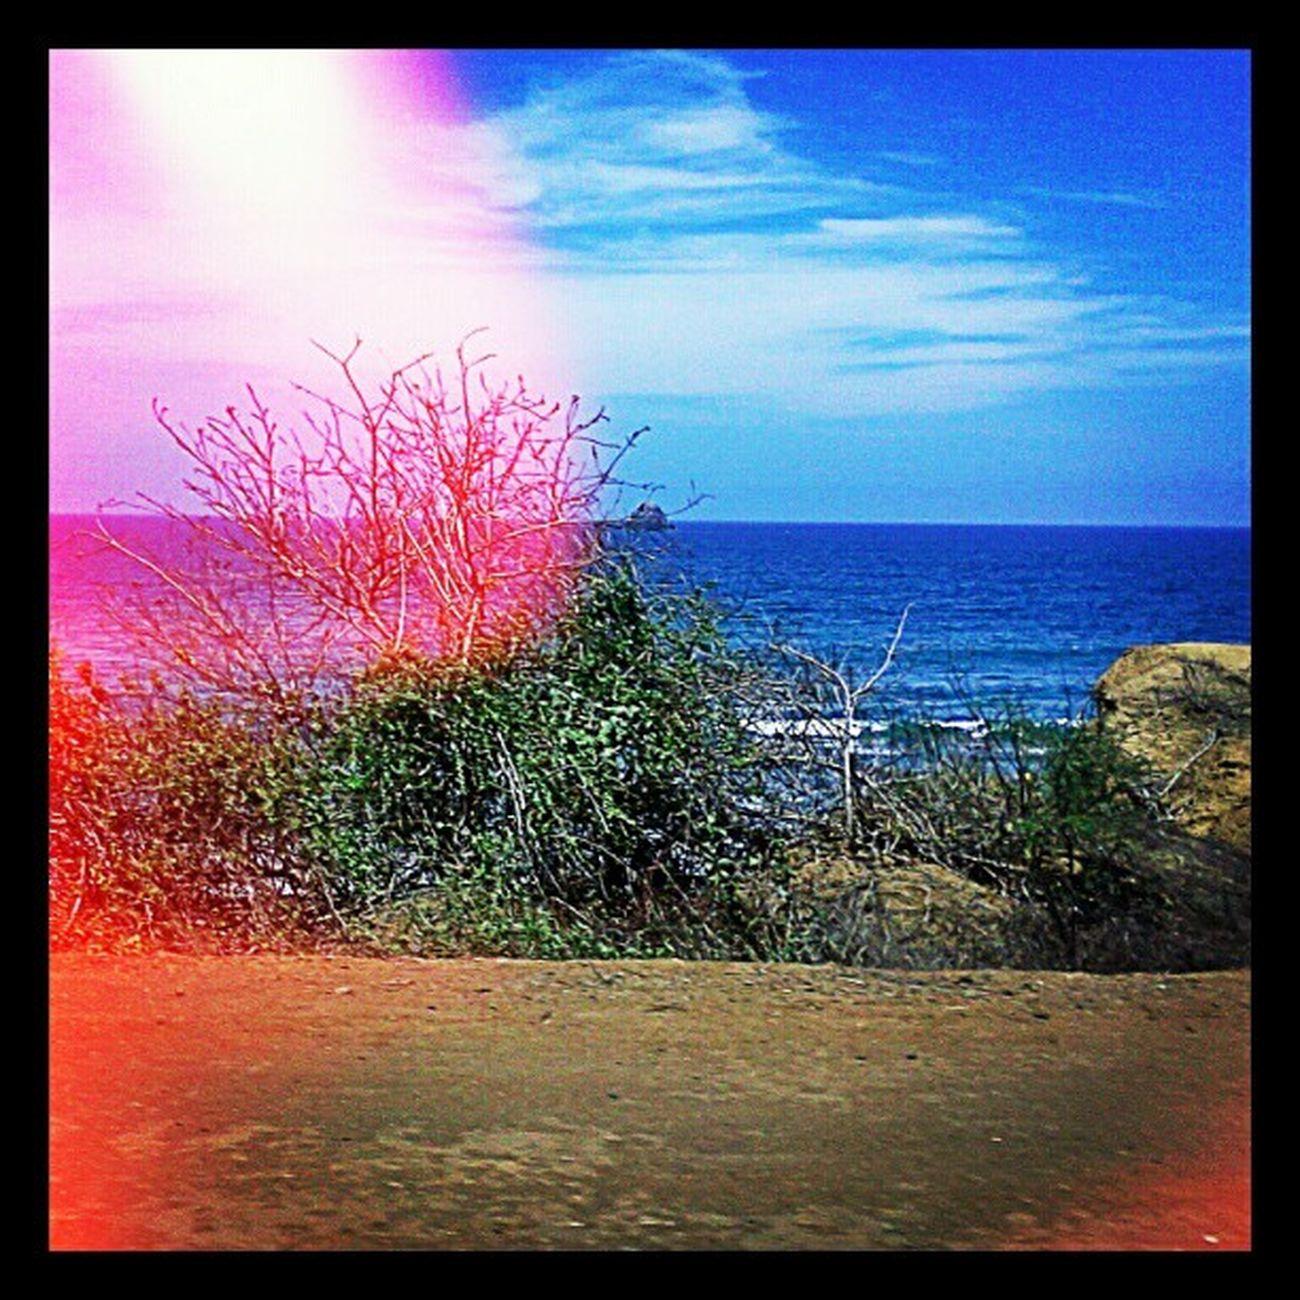 Spondylus Road Manabí Ecuador Love Landscape Instagood Beach